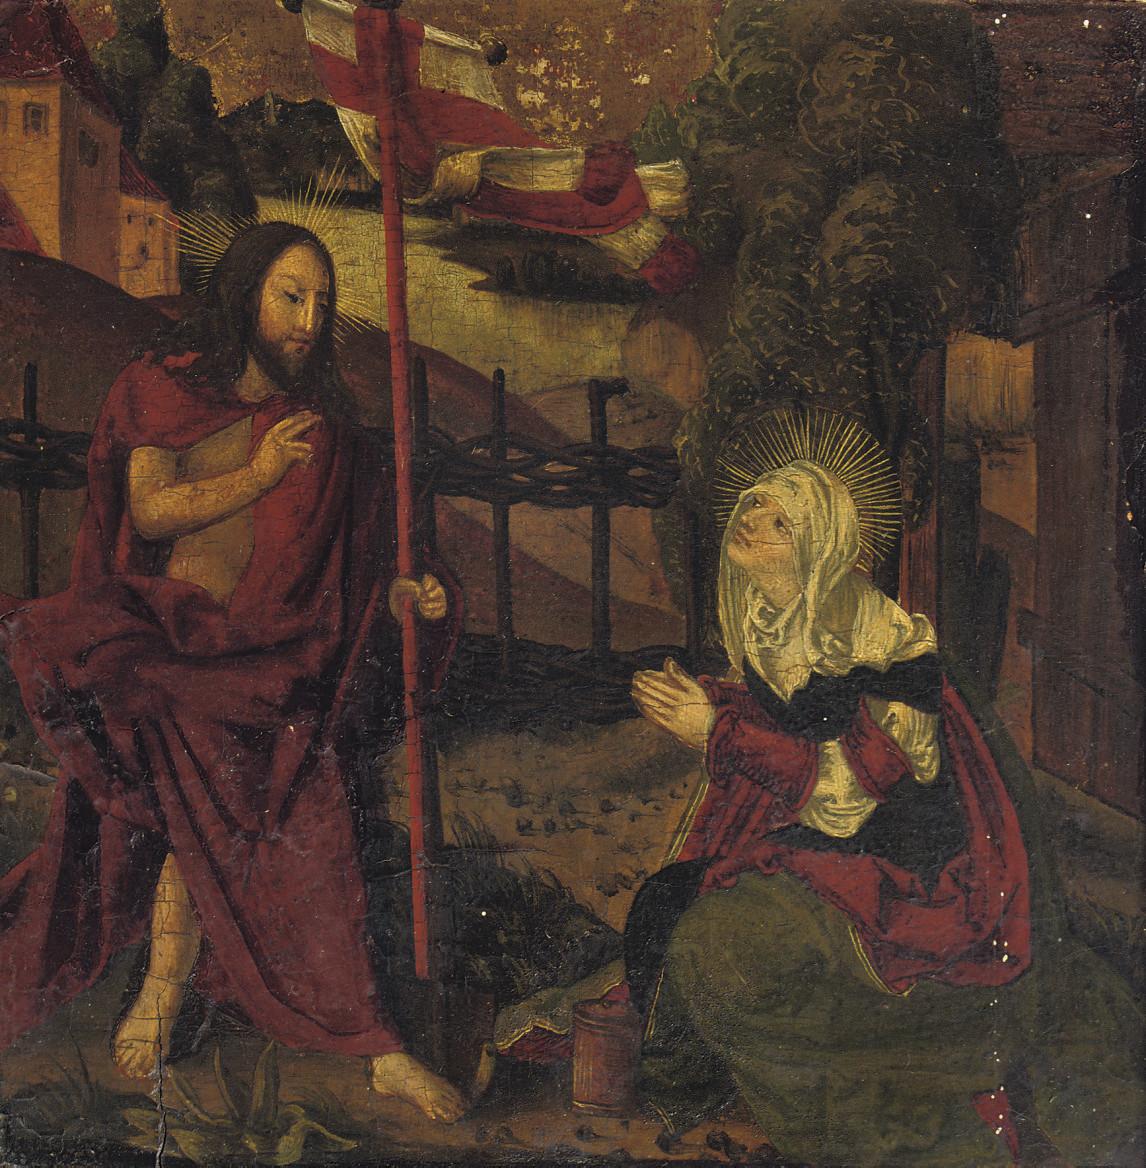 South German School, c. 1515